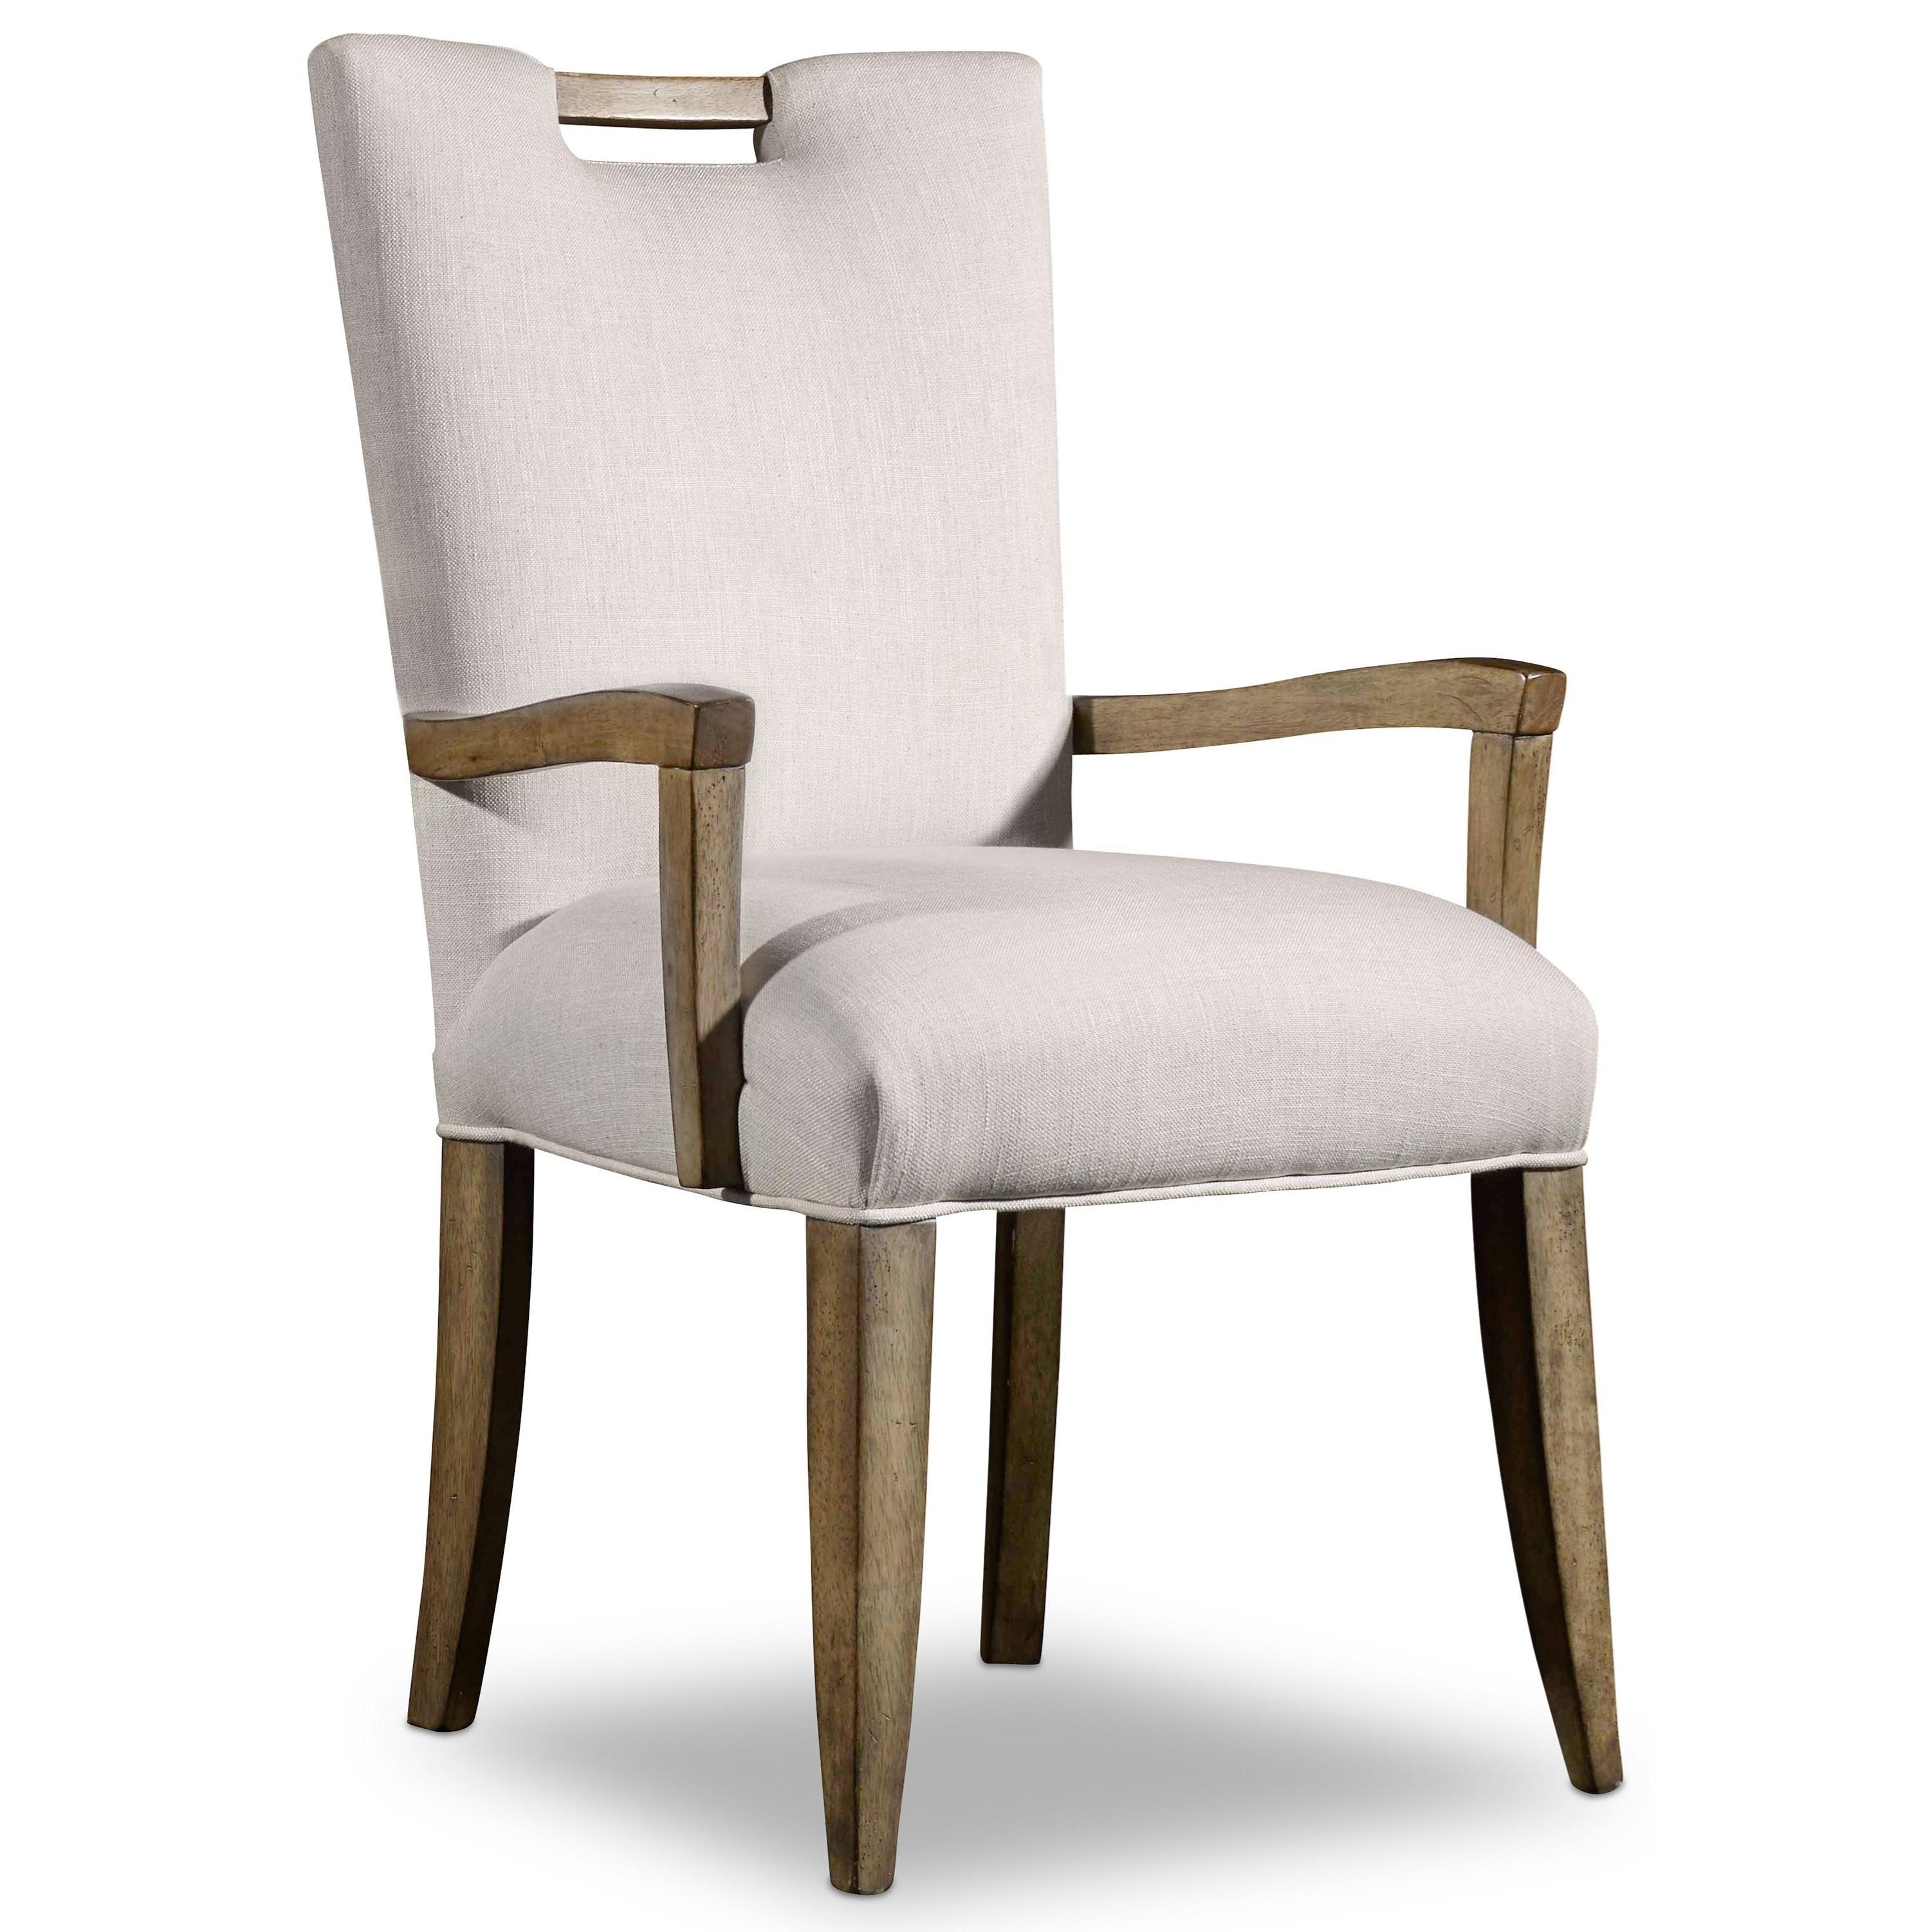 Joanna gaines and standard furniture myideasbedroom com